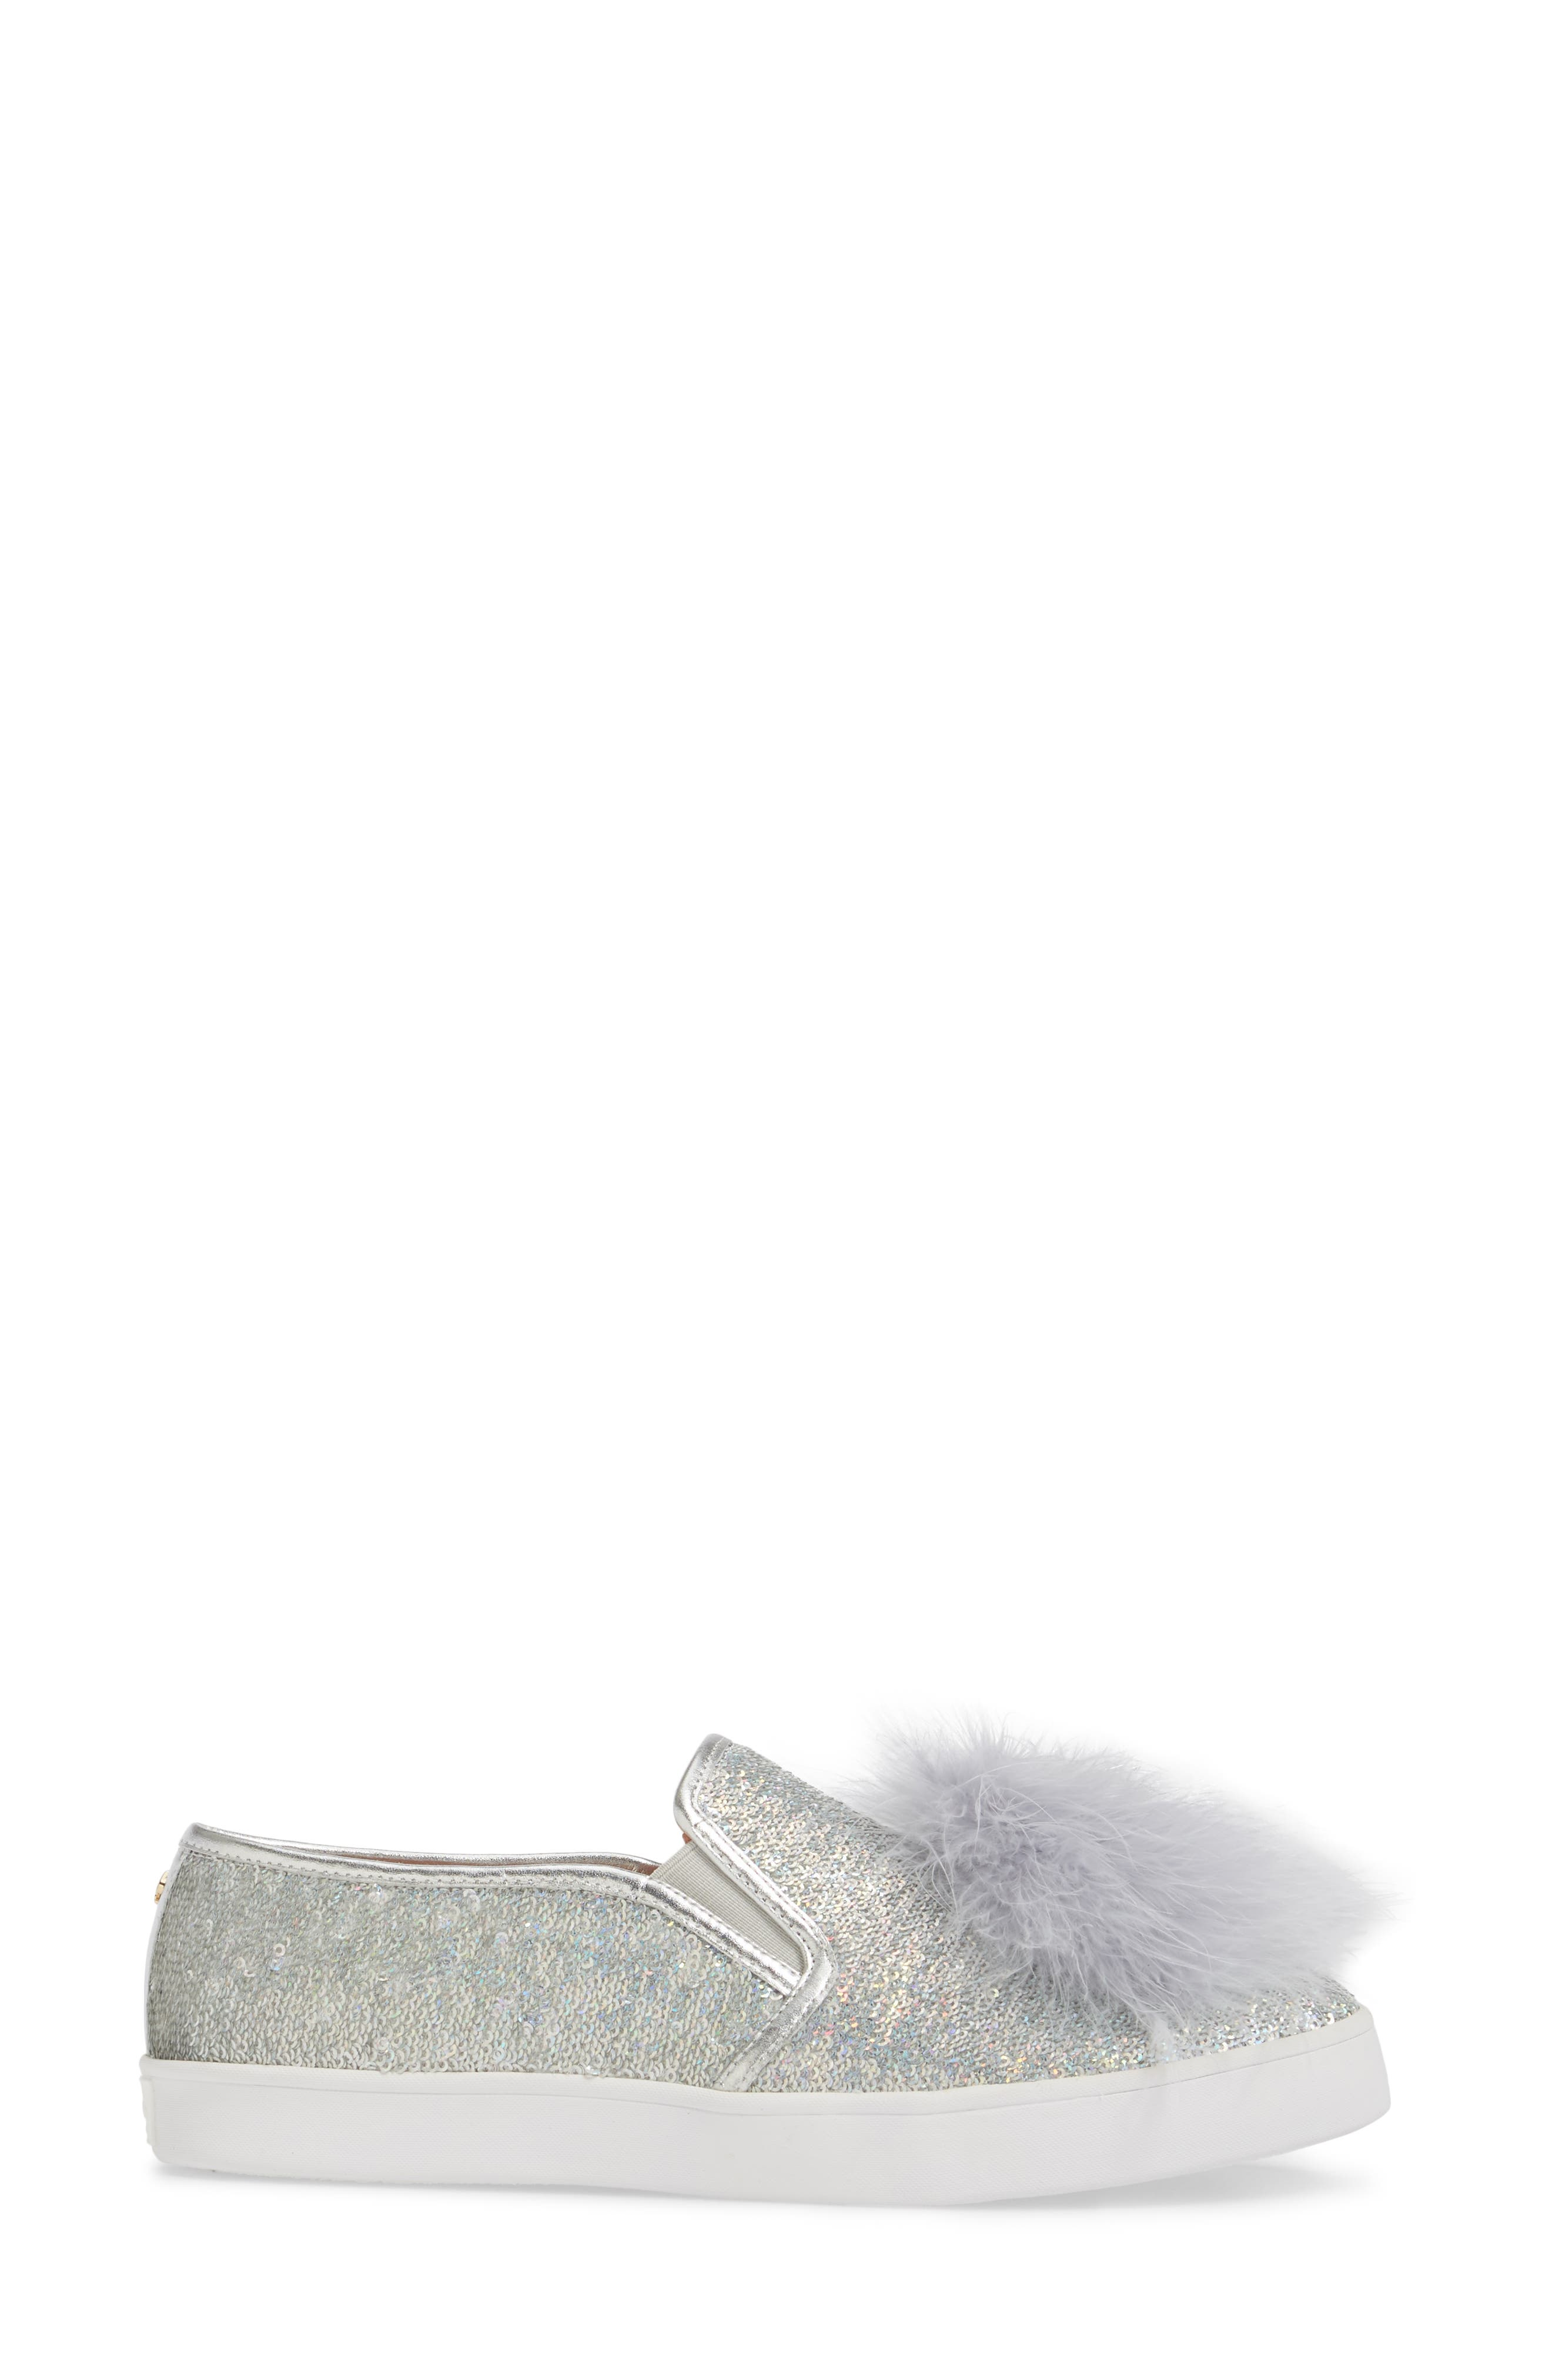 sequin slip-on sneaker,                             Alternate thumbnail 3, color,                             Silver Sequins